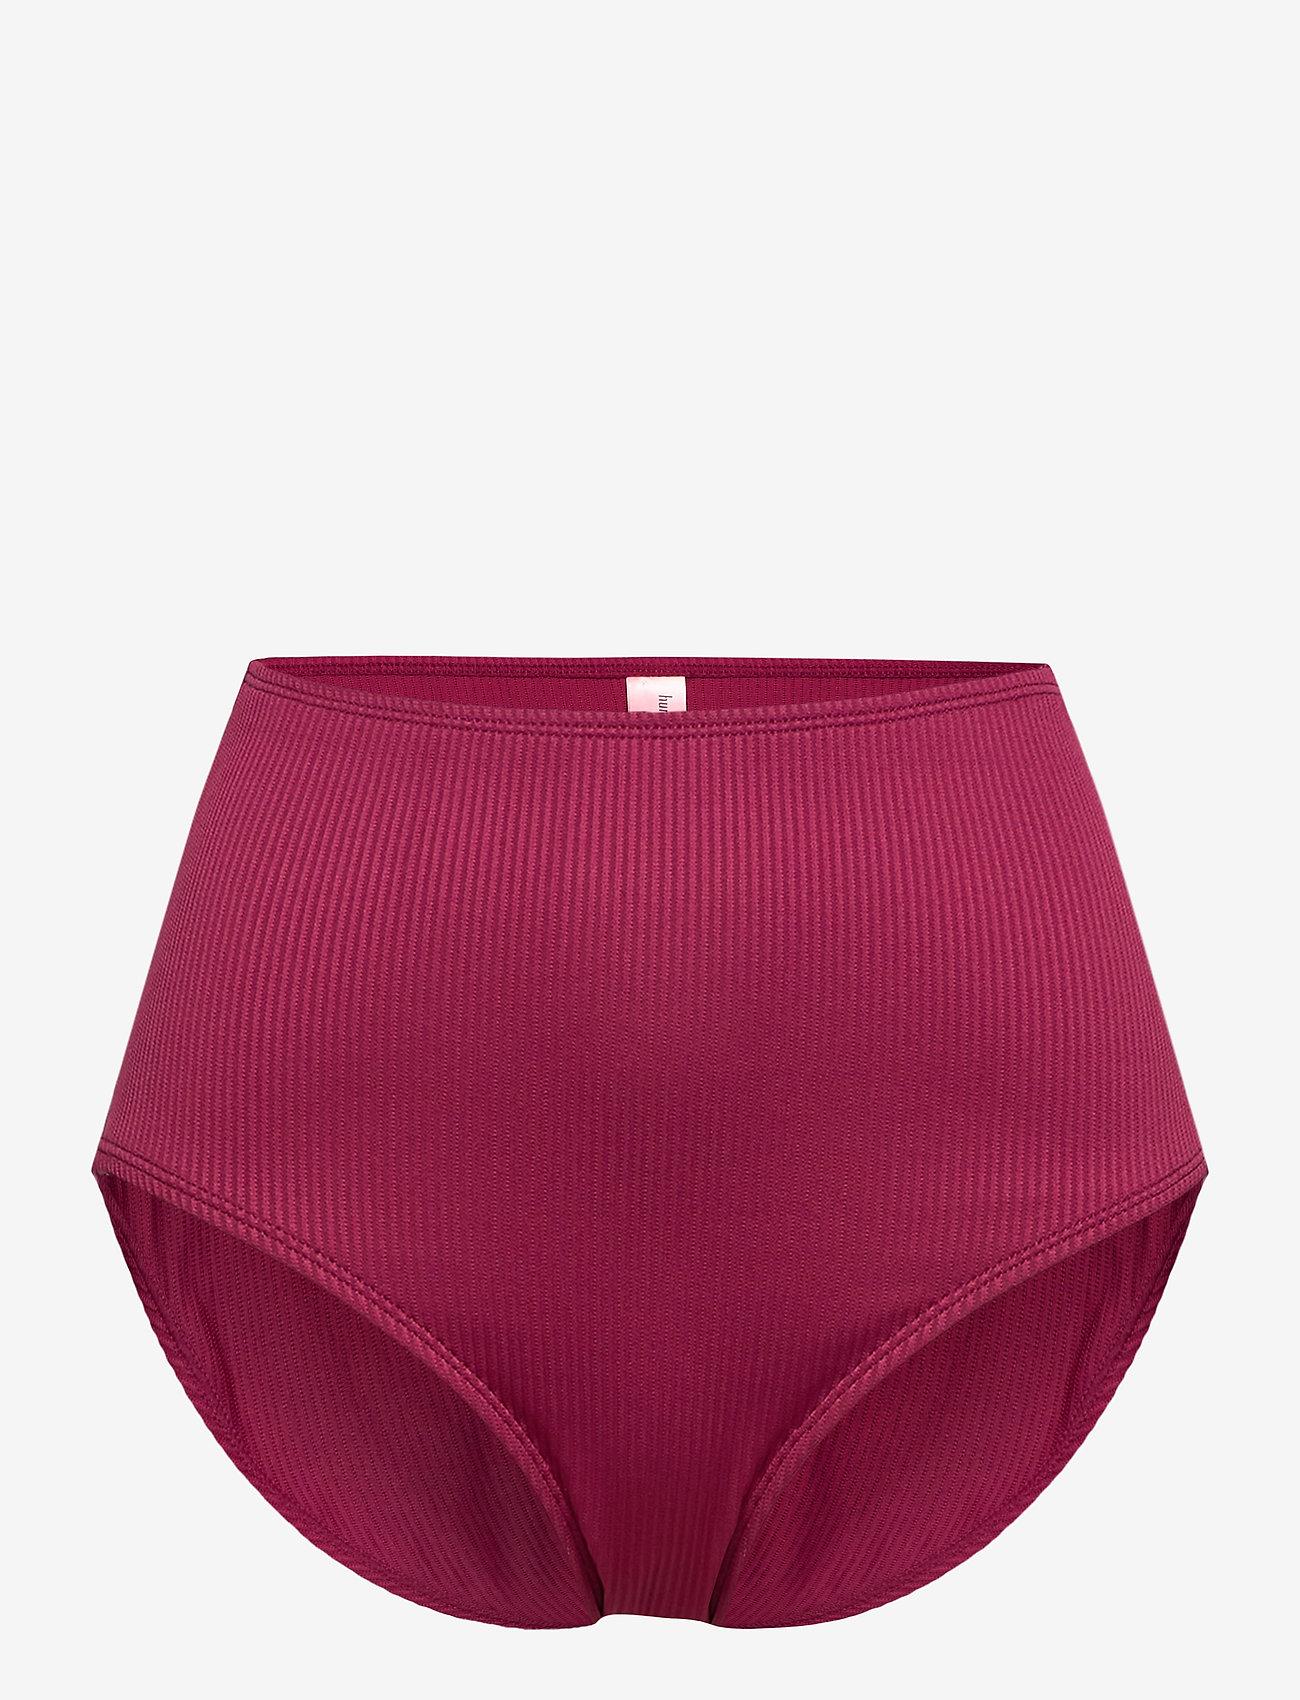 Hunkemöller - Golden rings rio hw - bikinibroekjes met hoge taille - red fruit - 0